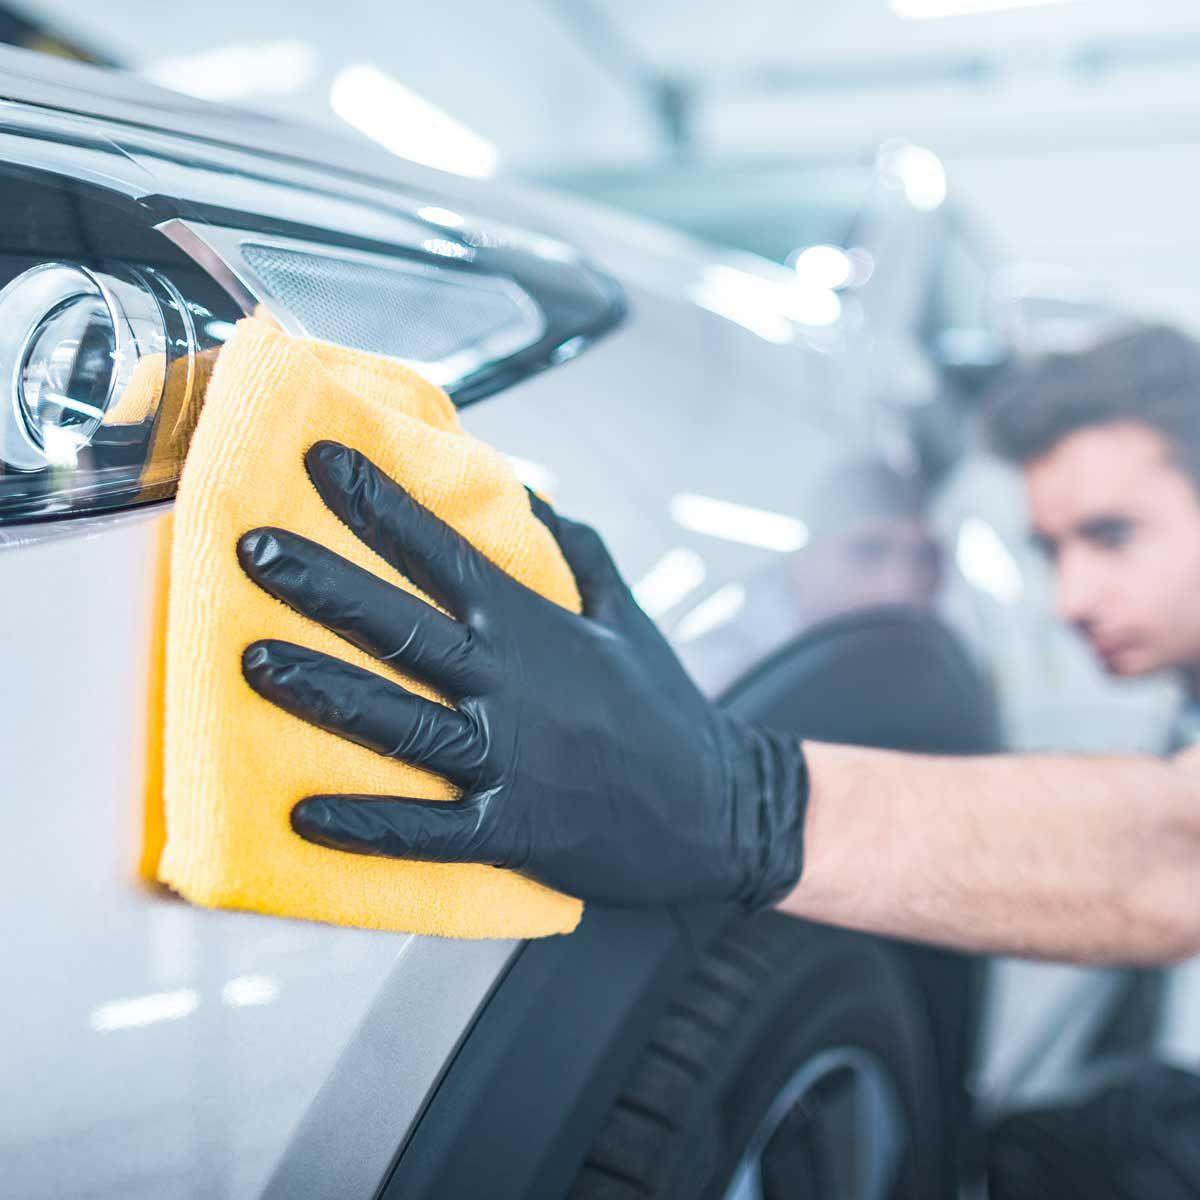 polishing car scratches